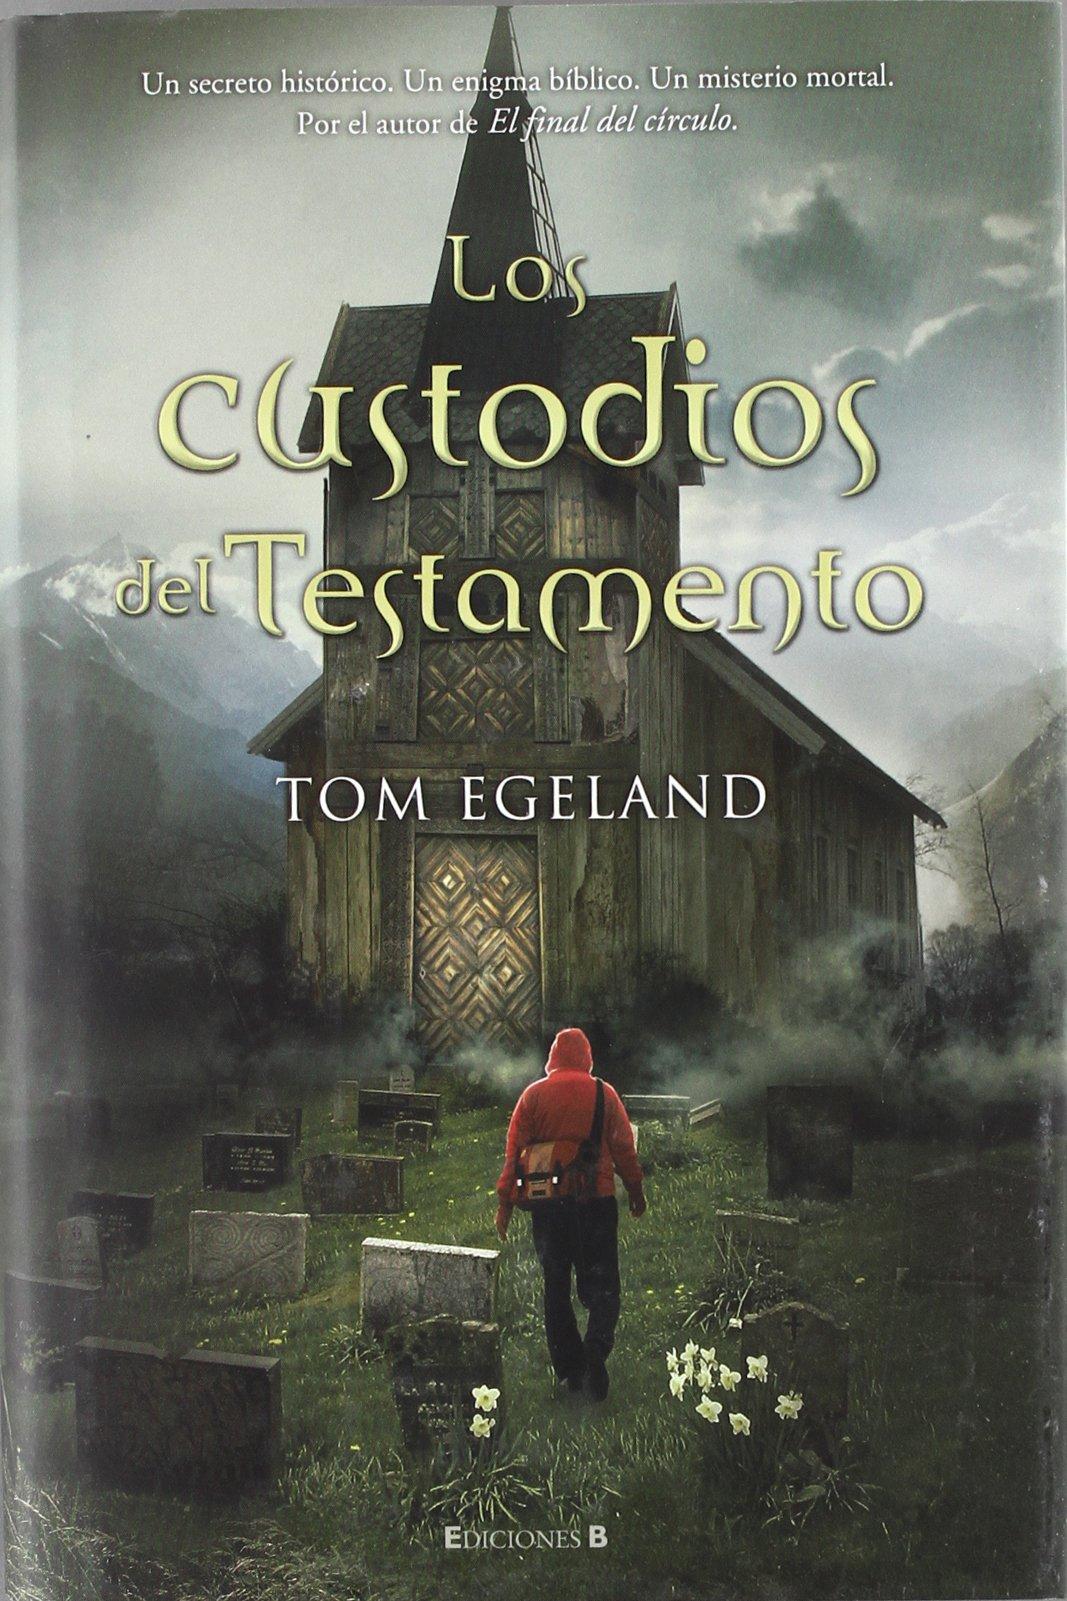 Custodios del testamento, Los (Spanish Edition): Egeland, Tom: 9788466636612: Amazon.com: Books